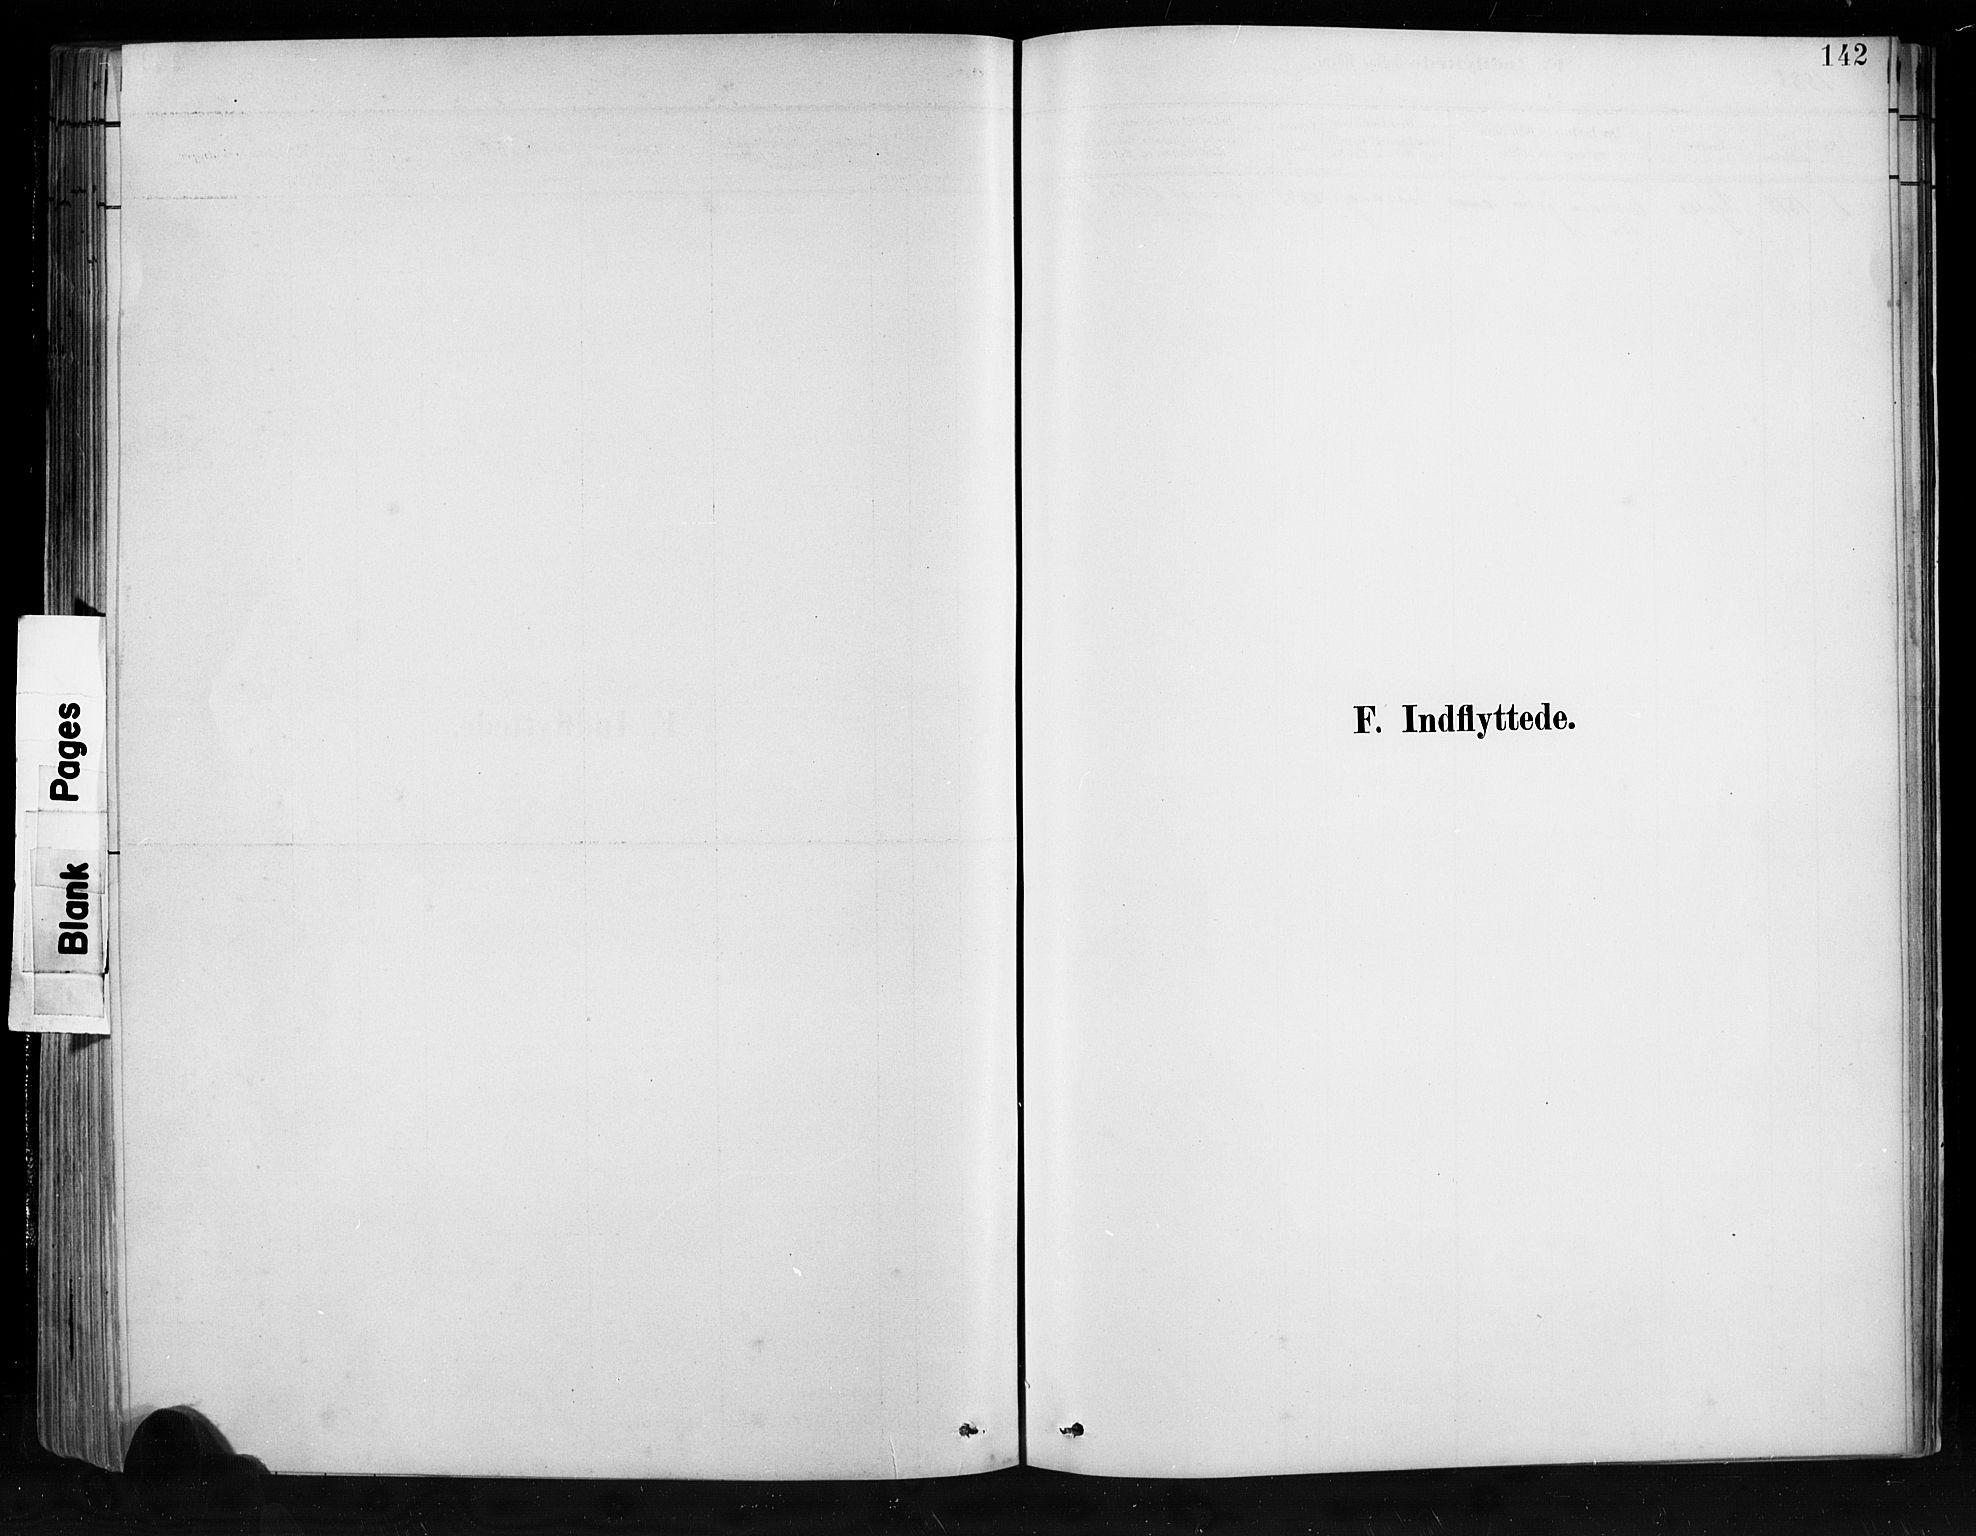 SAB, Jostedal sokneprestembete, H/Hab/Habb/L0001: Klokkerbok nr. B 1, 1882-1921, s. 142